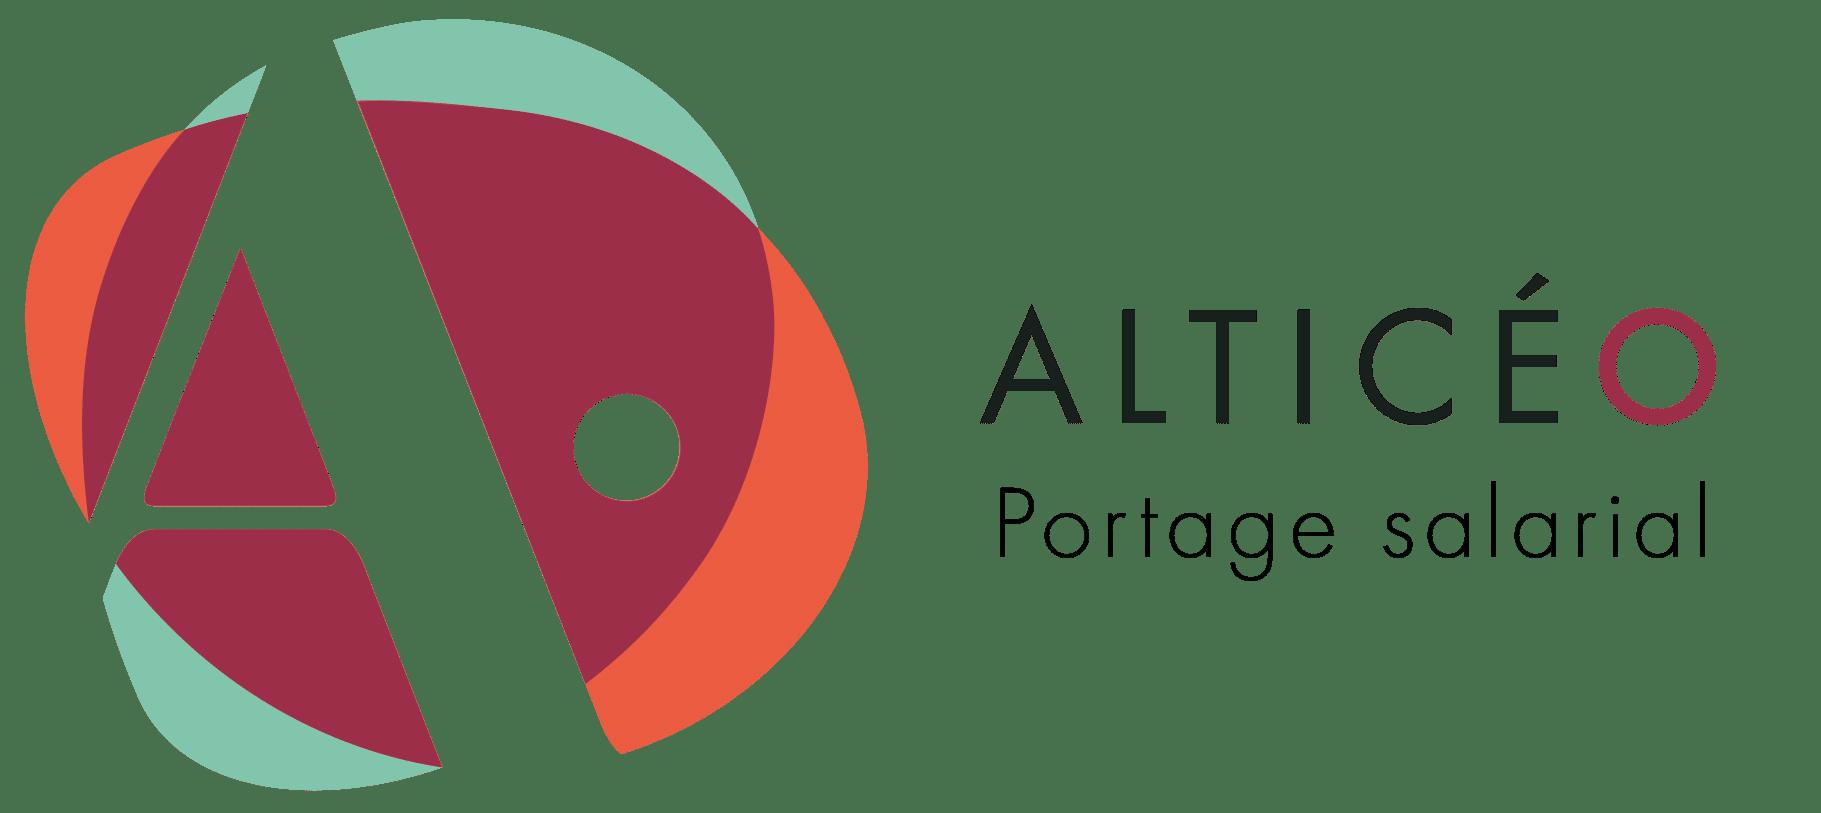 Société de portage salarial Alticéo